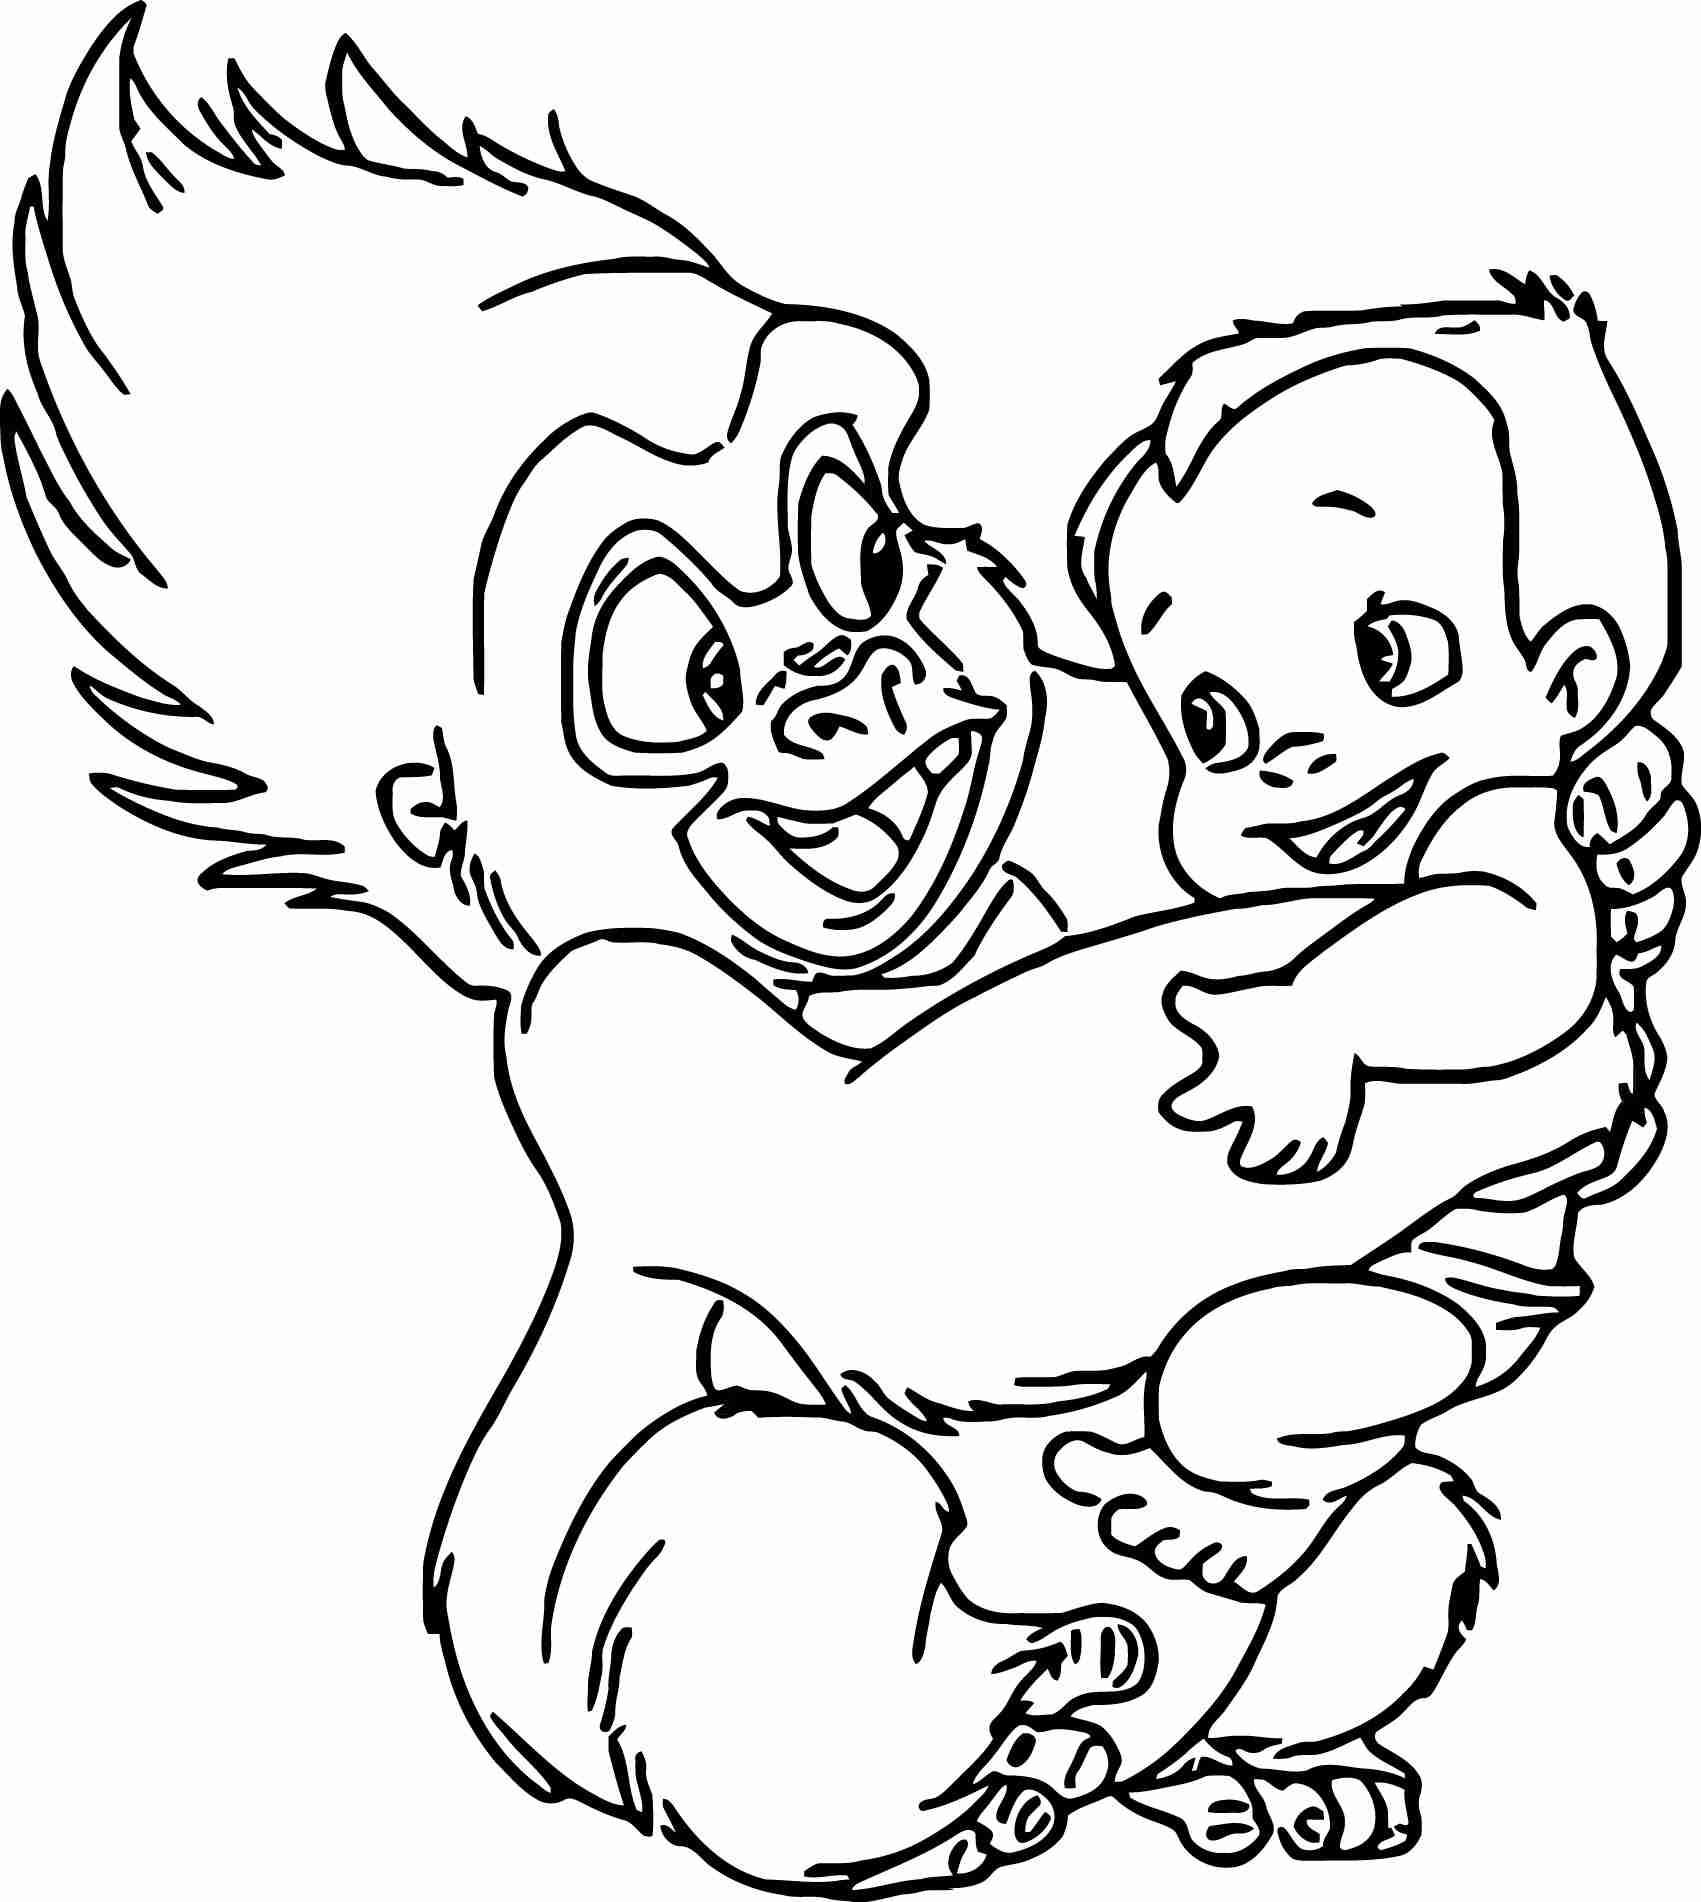 1701x1902 Disney Baby Tarzan Coloring Pages C Unbelievable Olegratiy